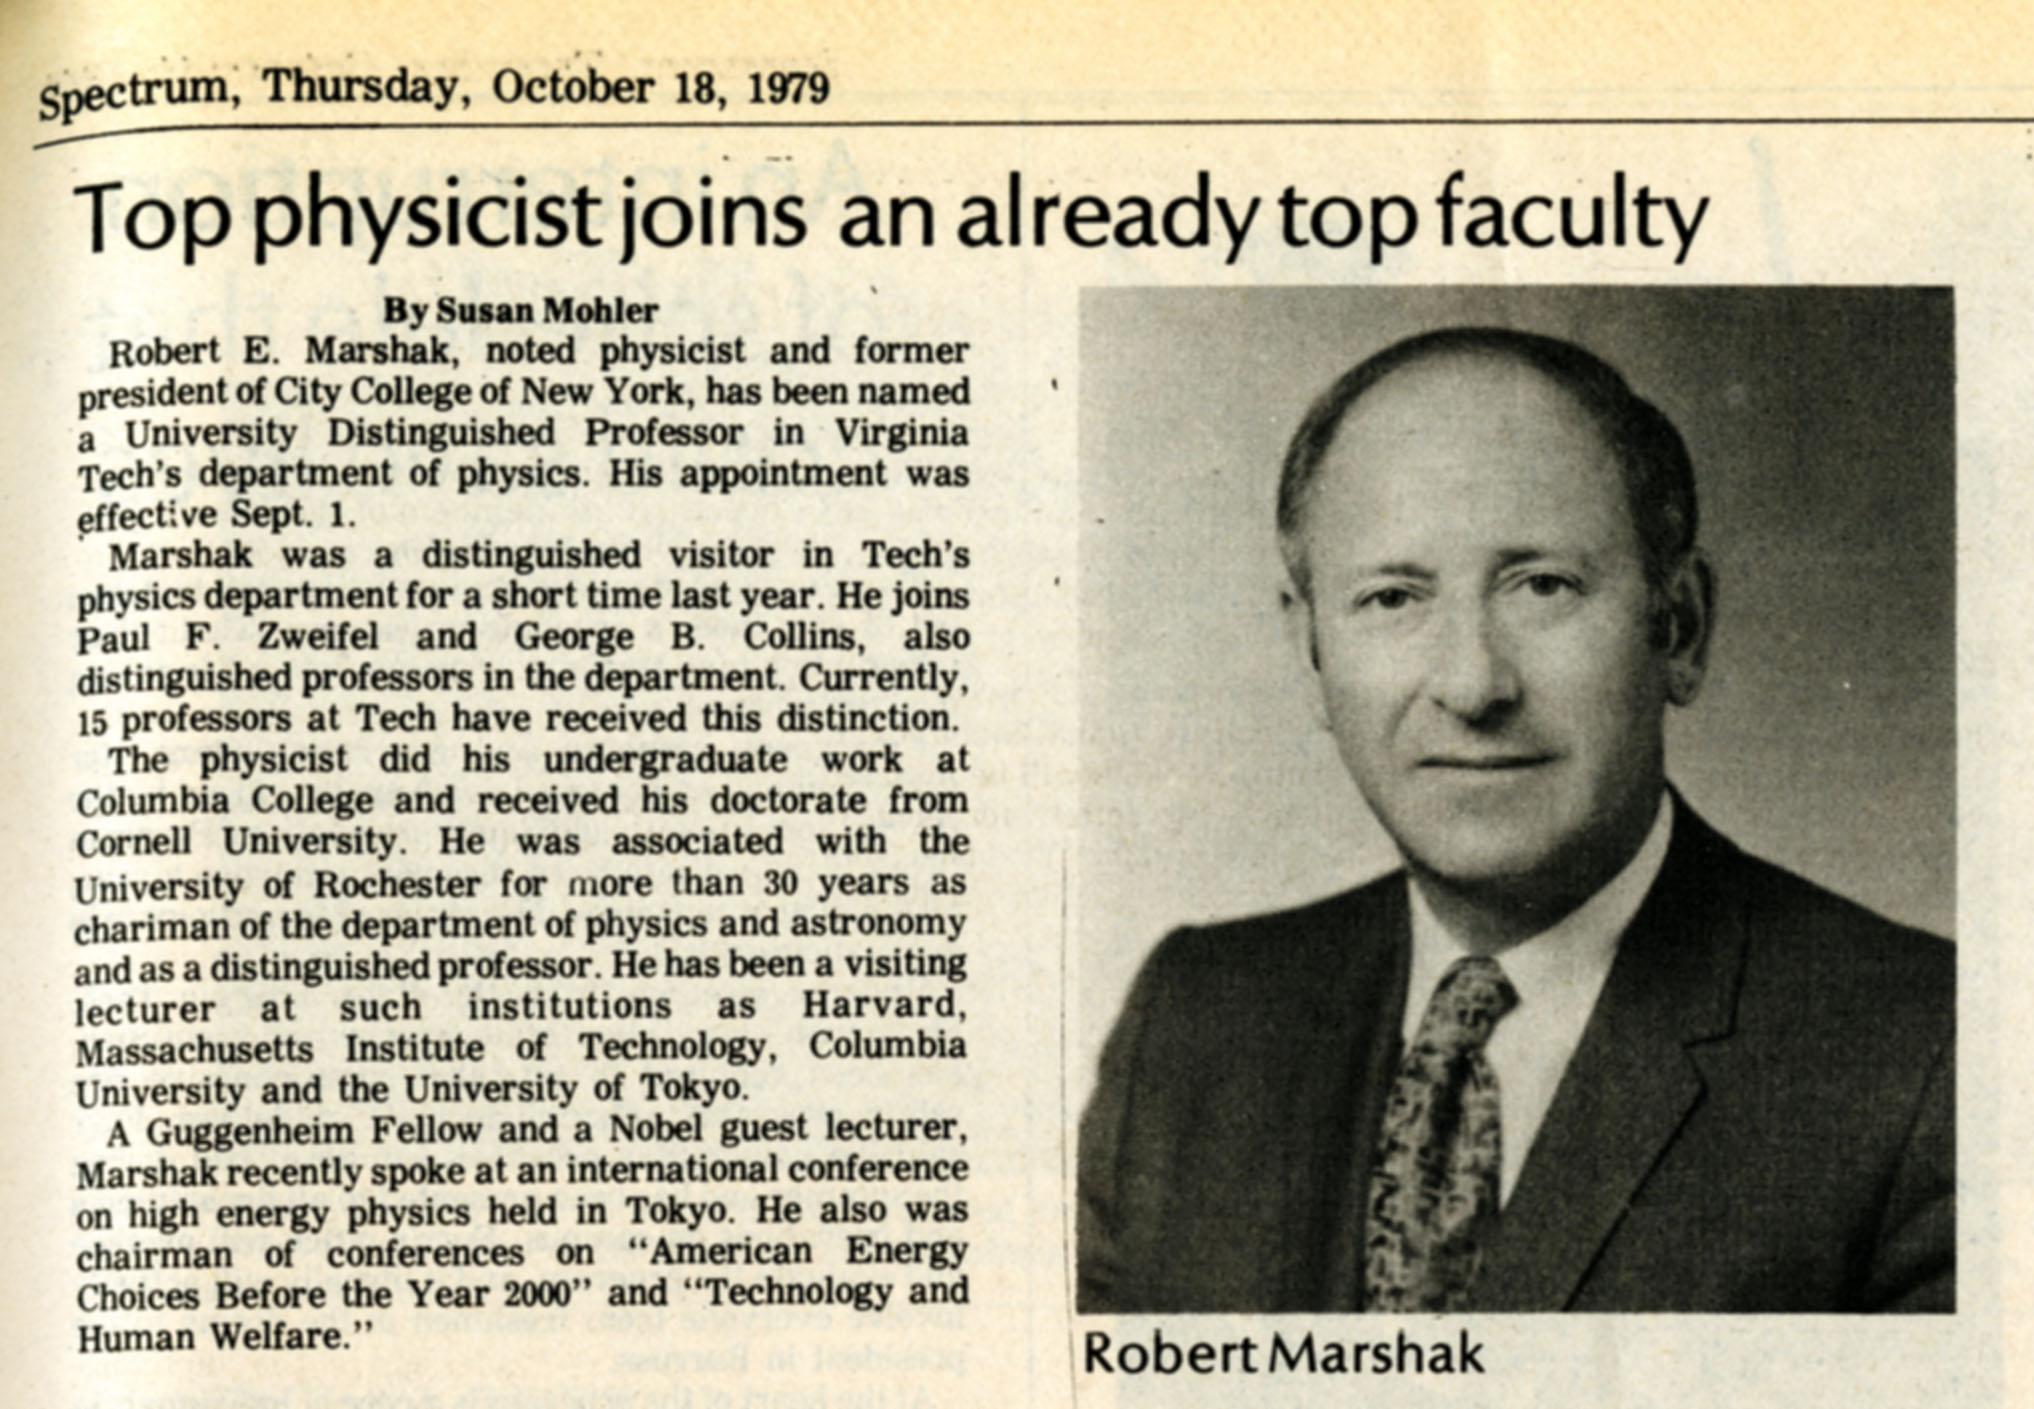 Robert Marshak joins faculty at Virginia Tech, 1 Sept. 1979